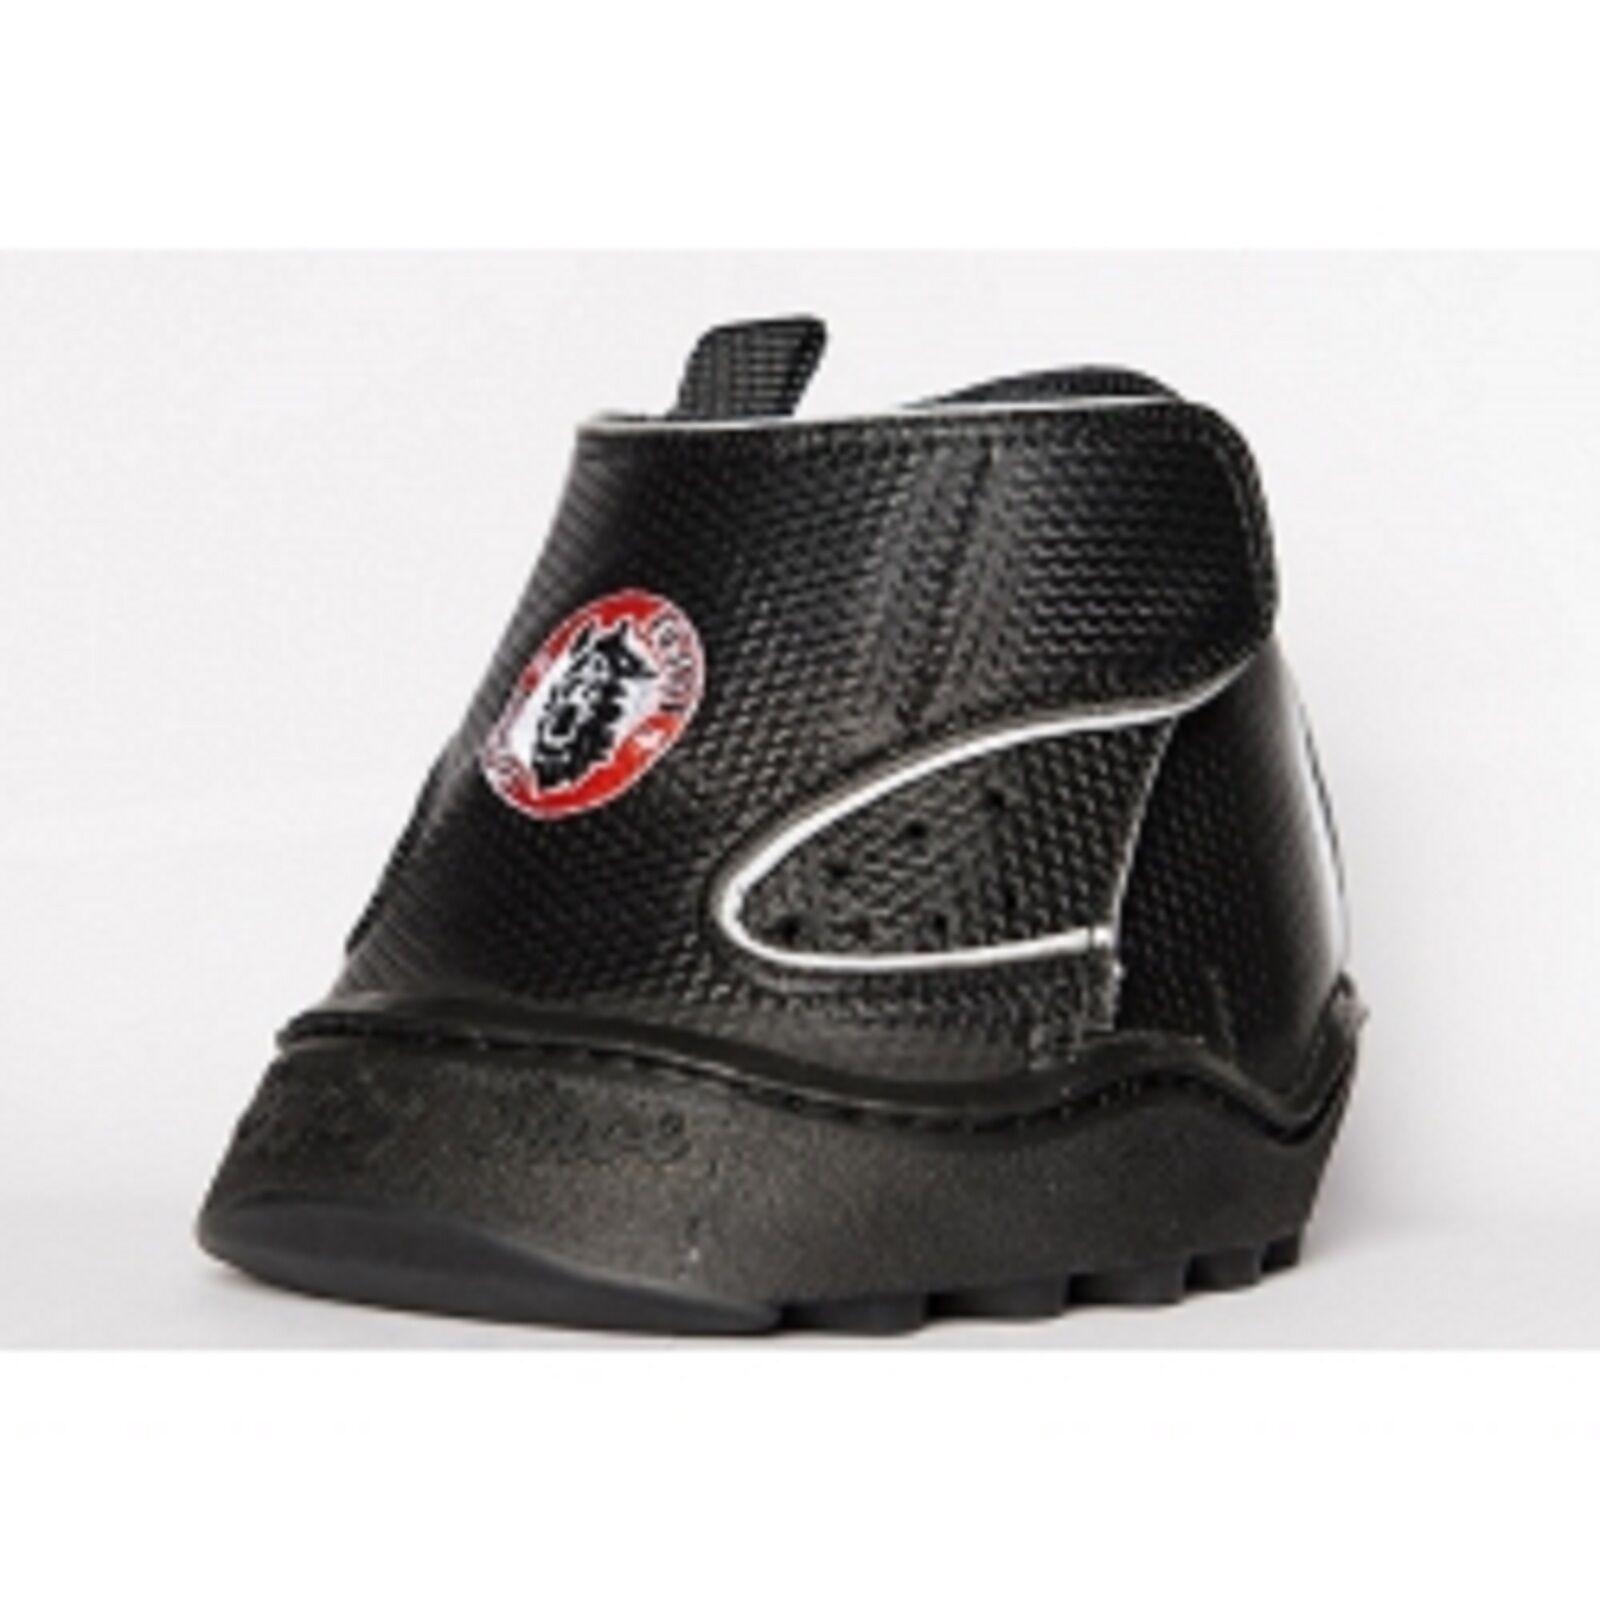 Equine Fusion ALL TERRAIN SLIM Hoof Boot